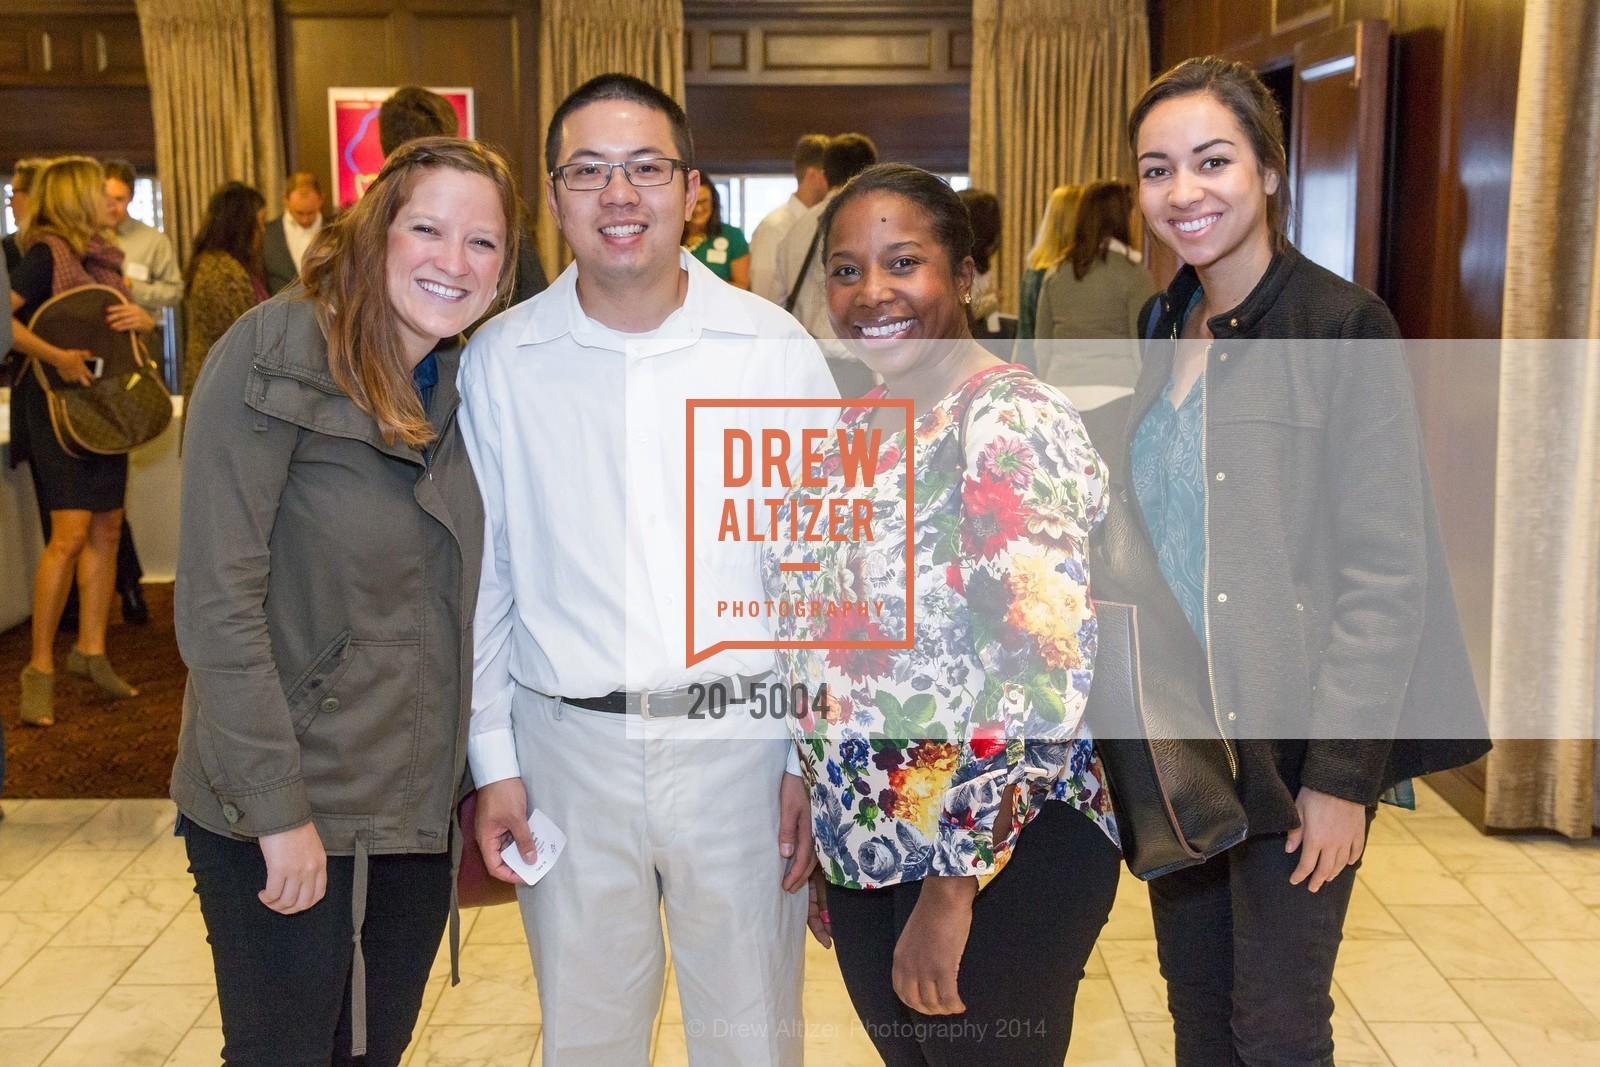 Kelly Salance, Eric Lin, Tiffany Thompson, Hannah Lawrence, Photo #20-5004